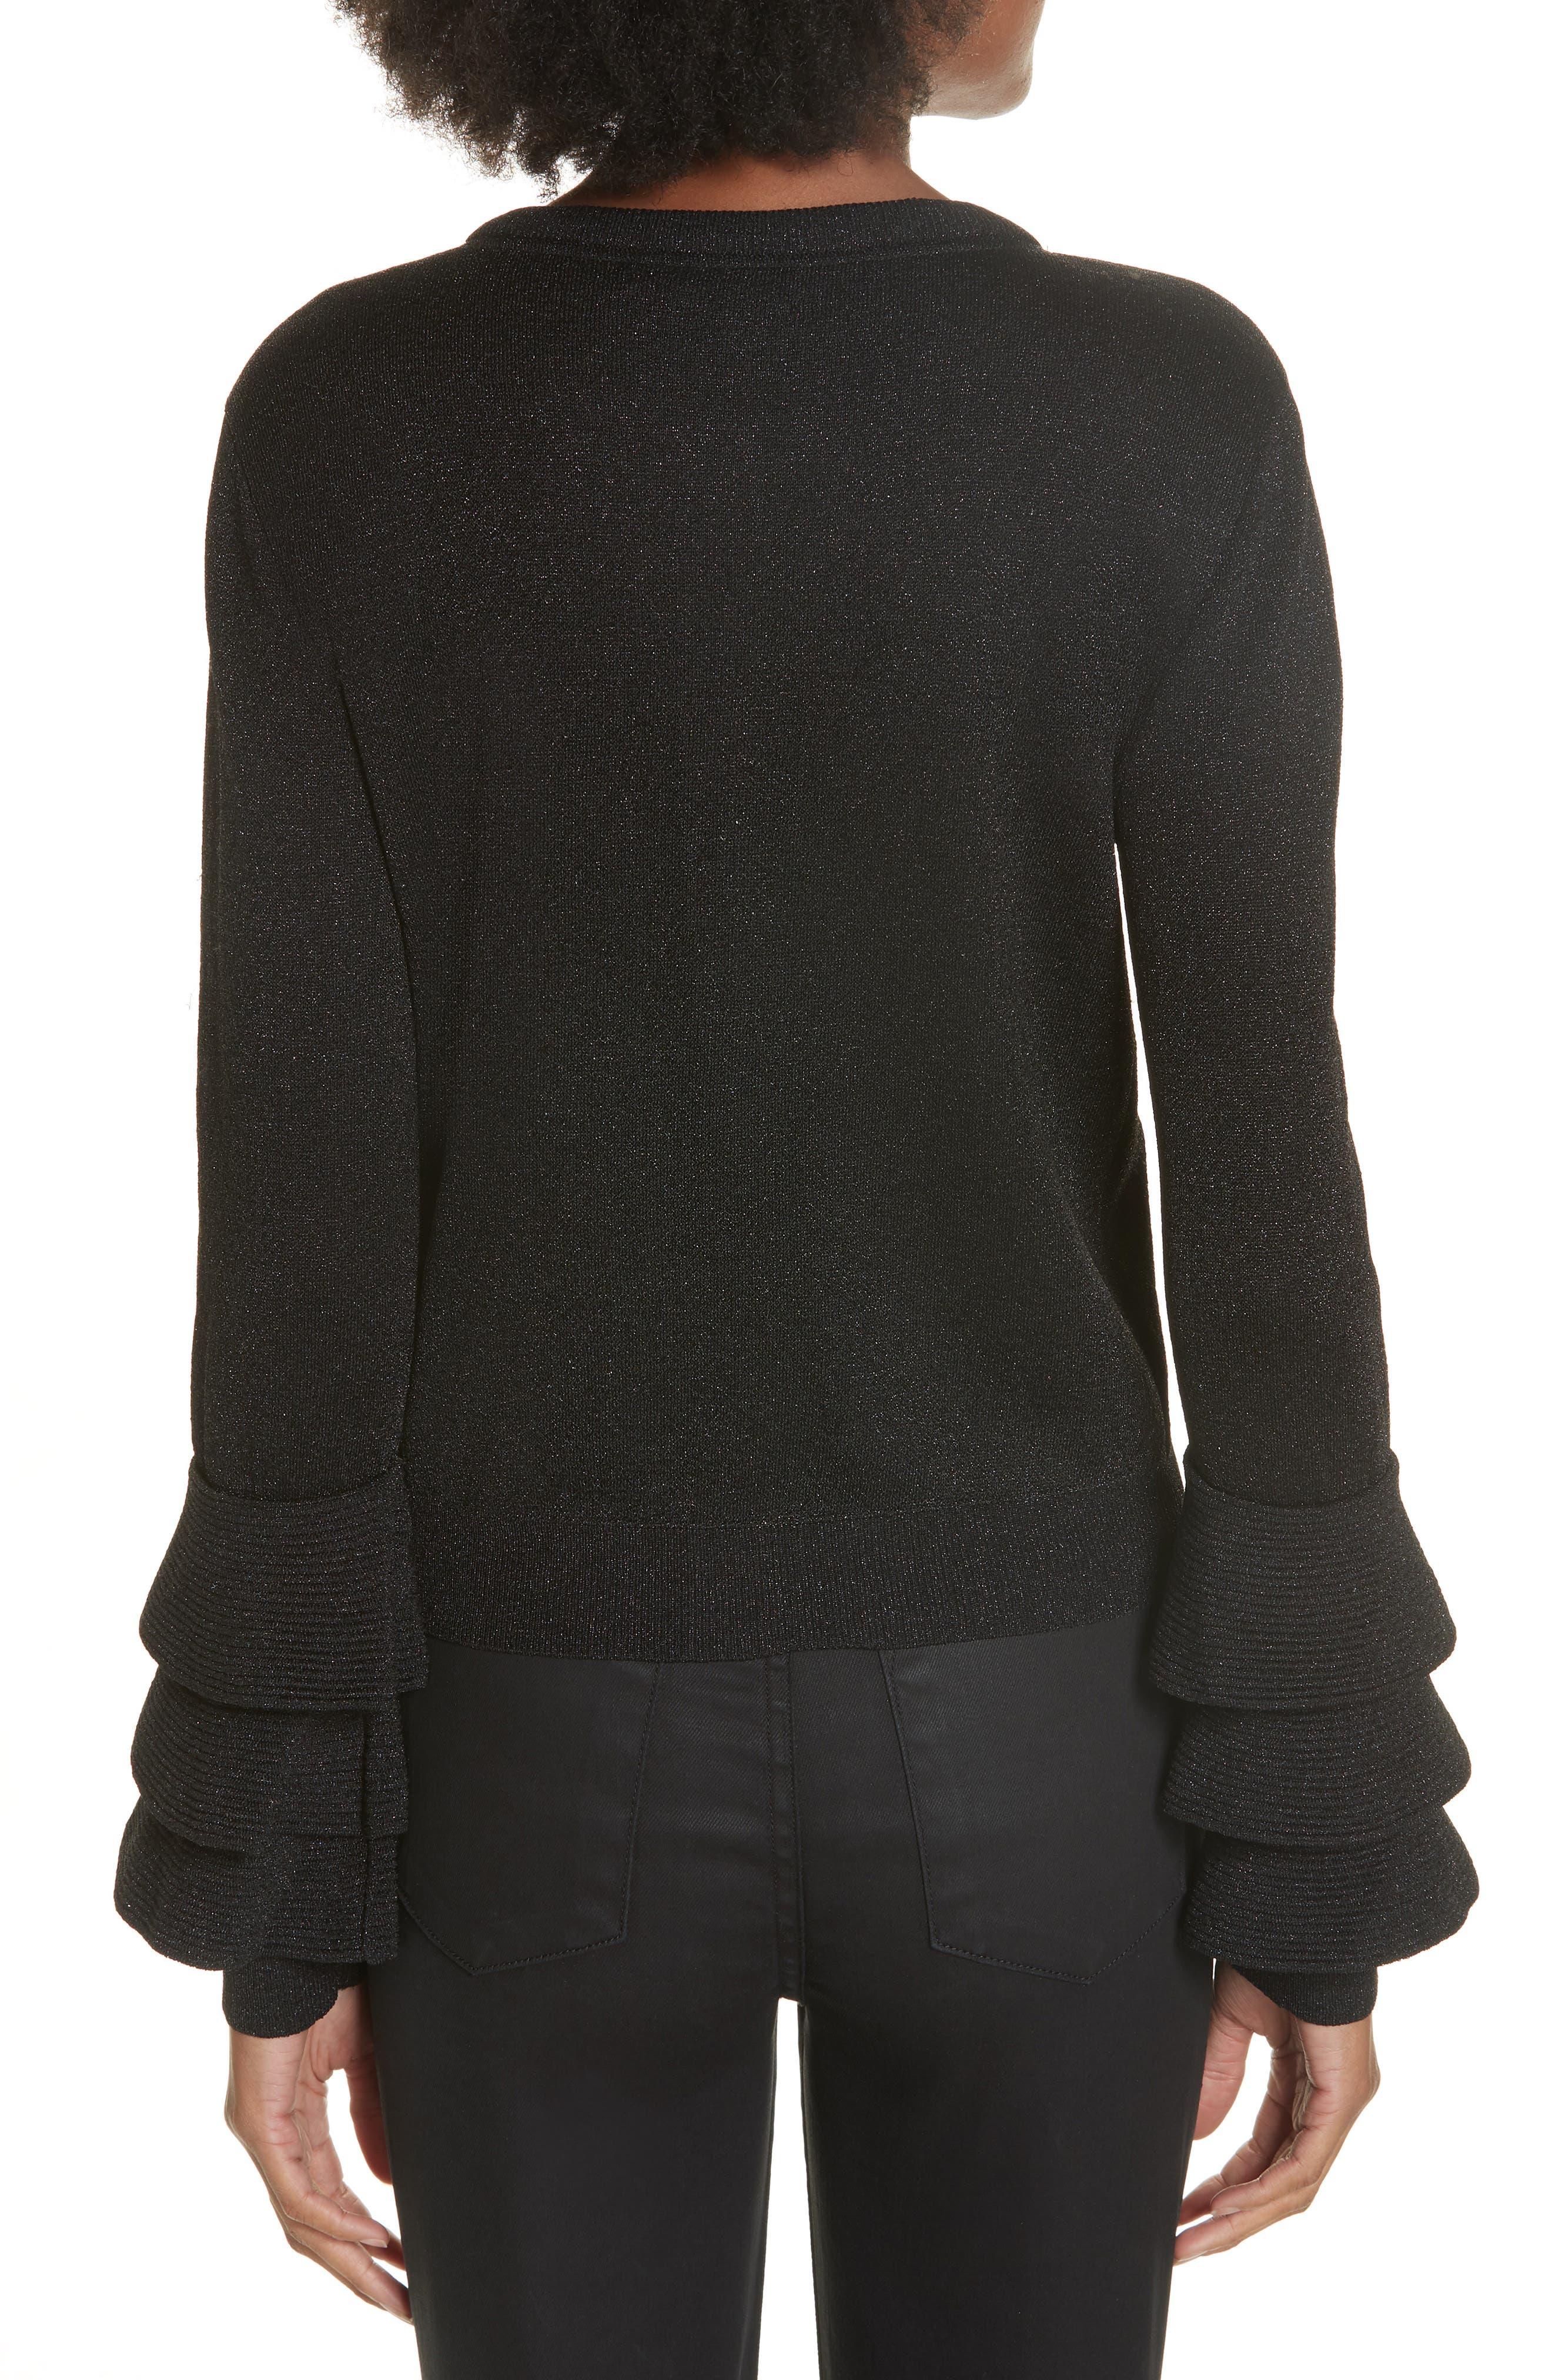 Ruthy Ruffle Cuff Sparkle Wool Blend Cardigan,                             Alternate thumbnail 2, color,                             BLACK METALLIC